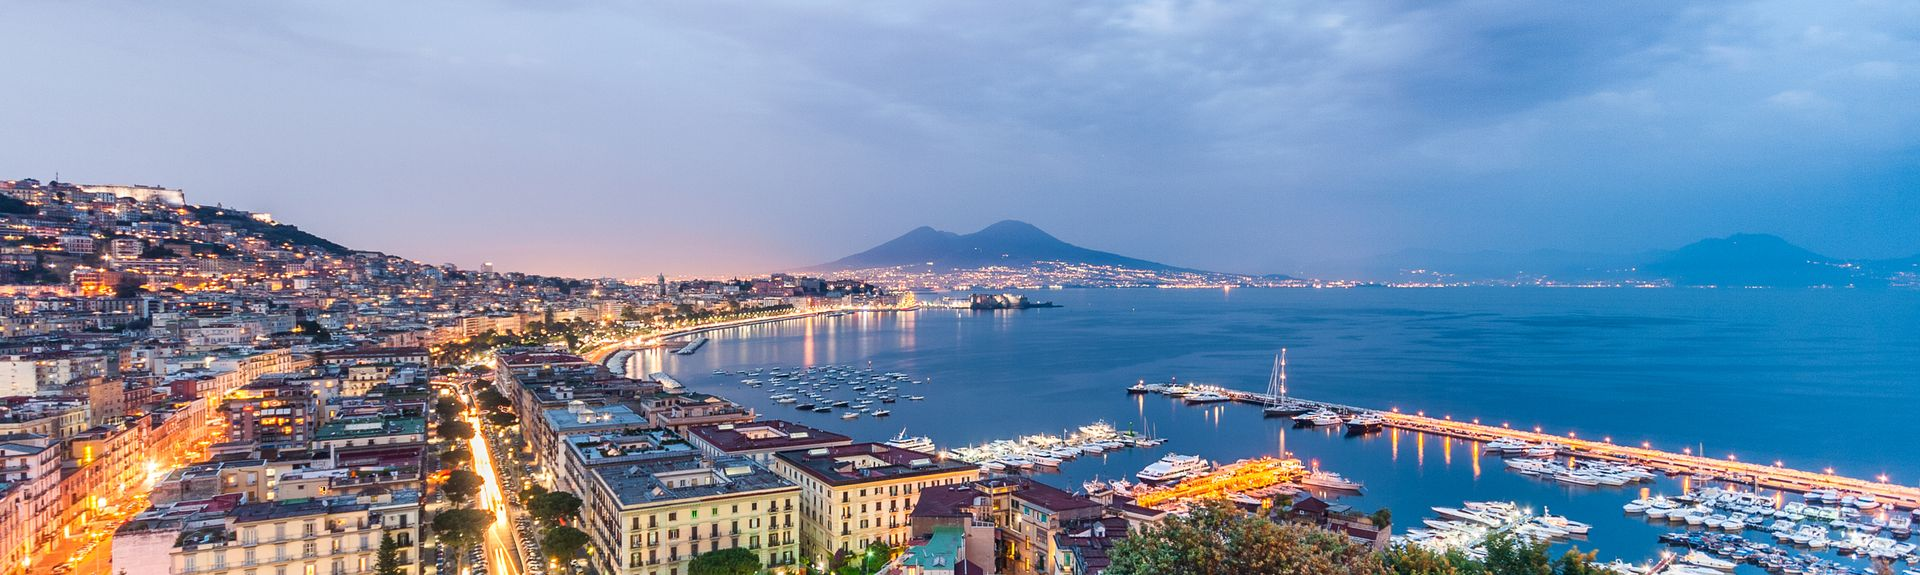 Napoli, Napoli, Campania, Italia